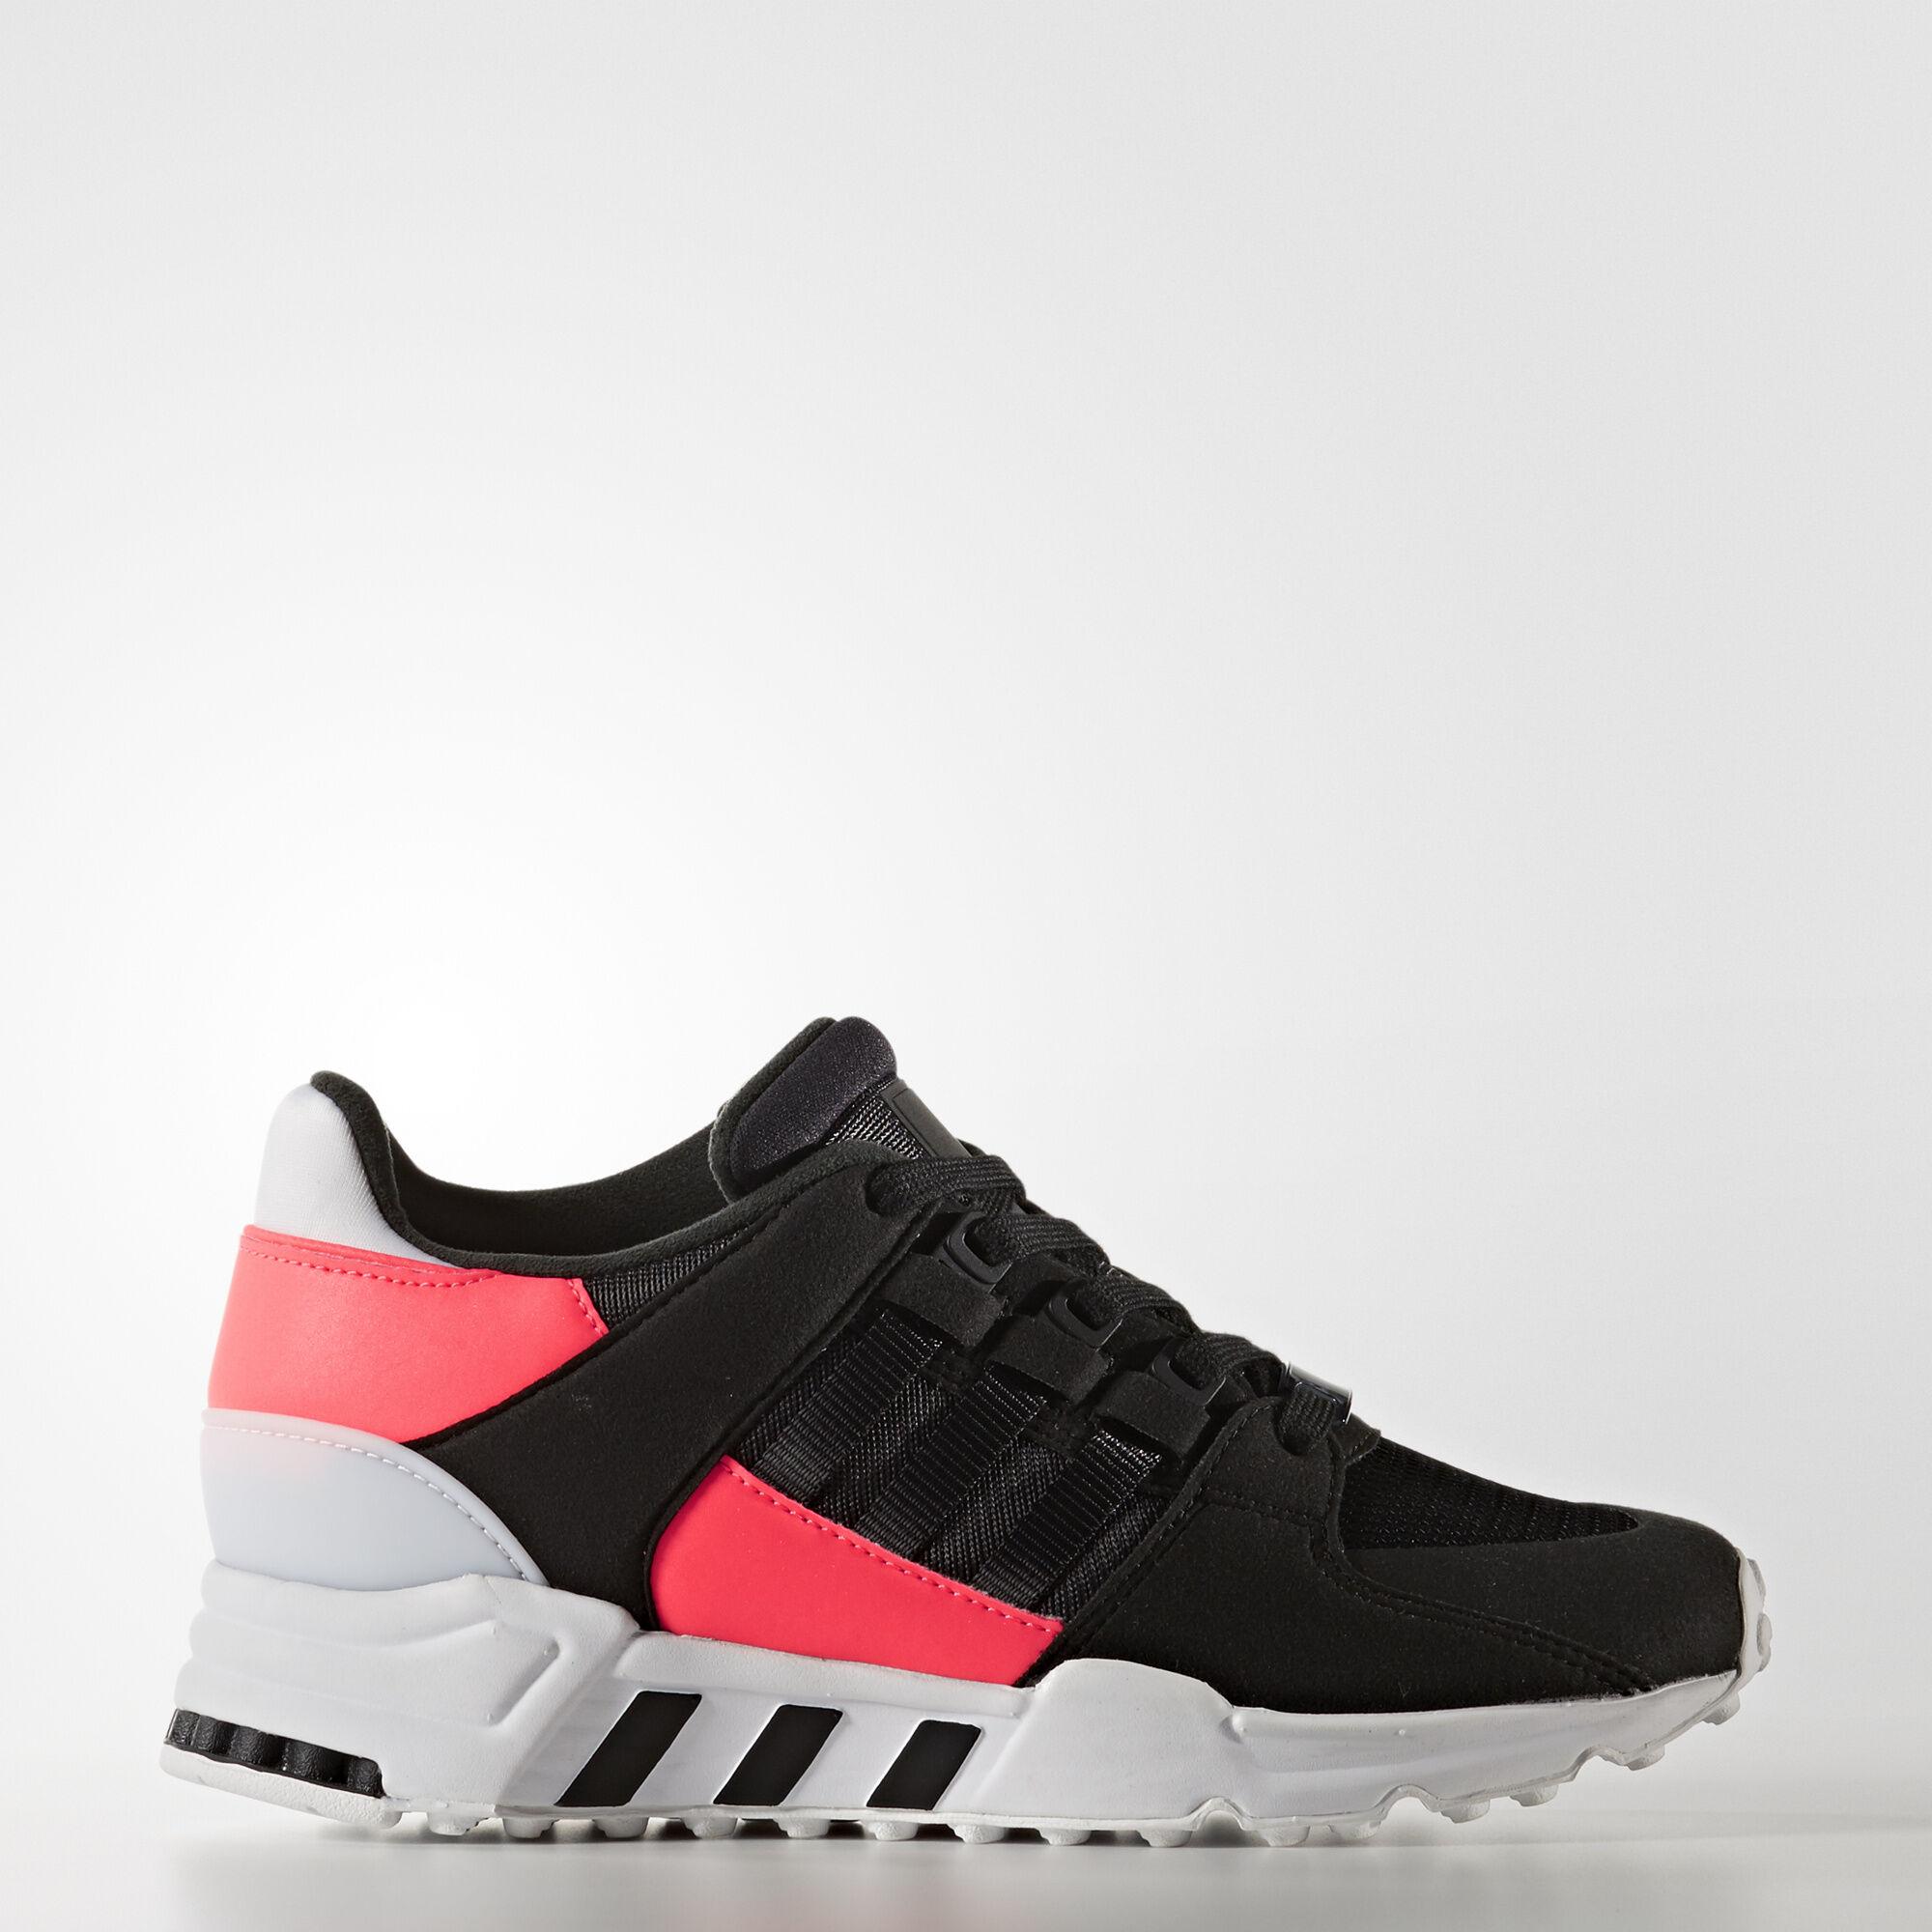 Adidas Eqt Running S